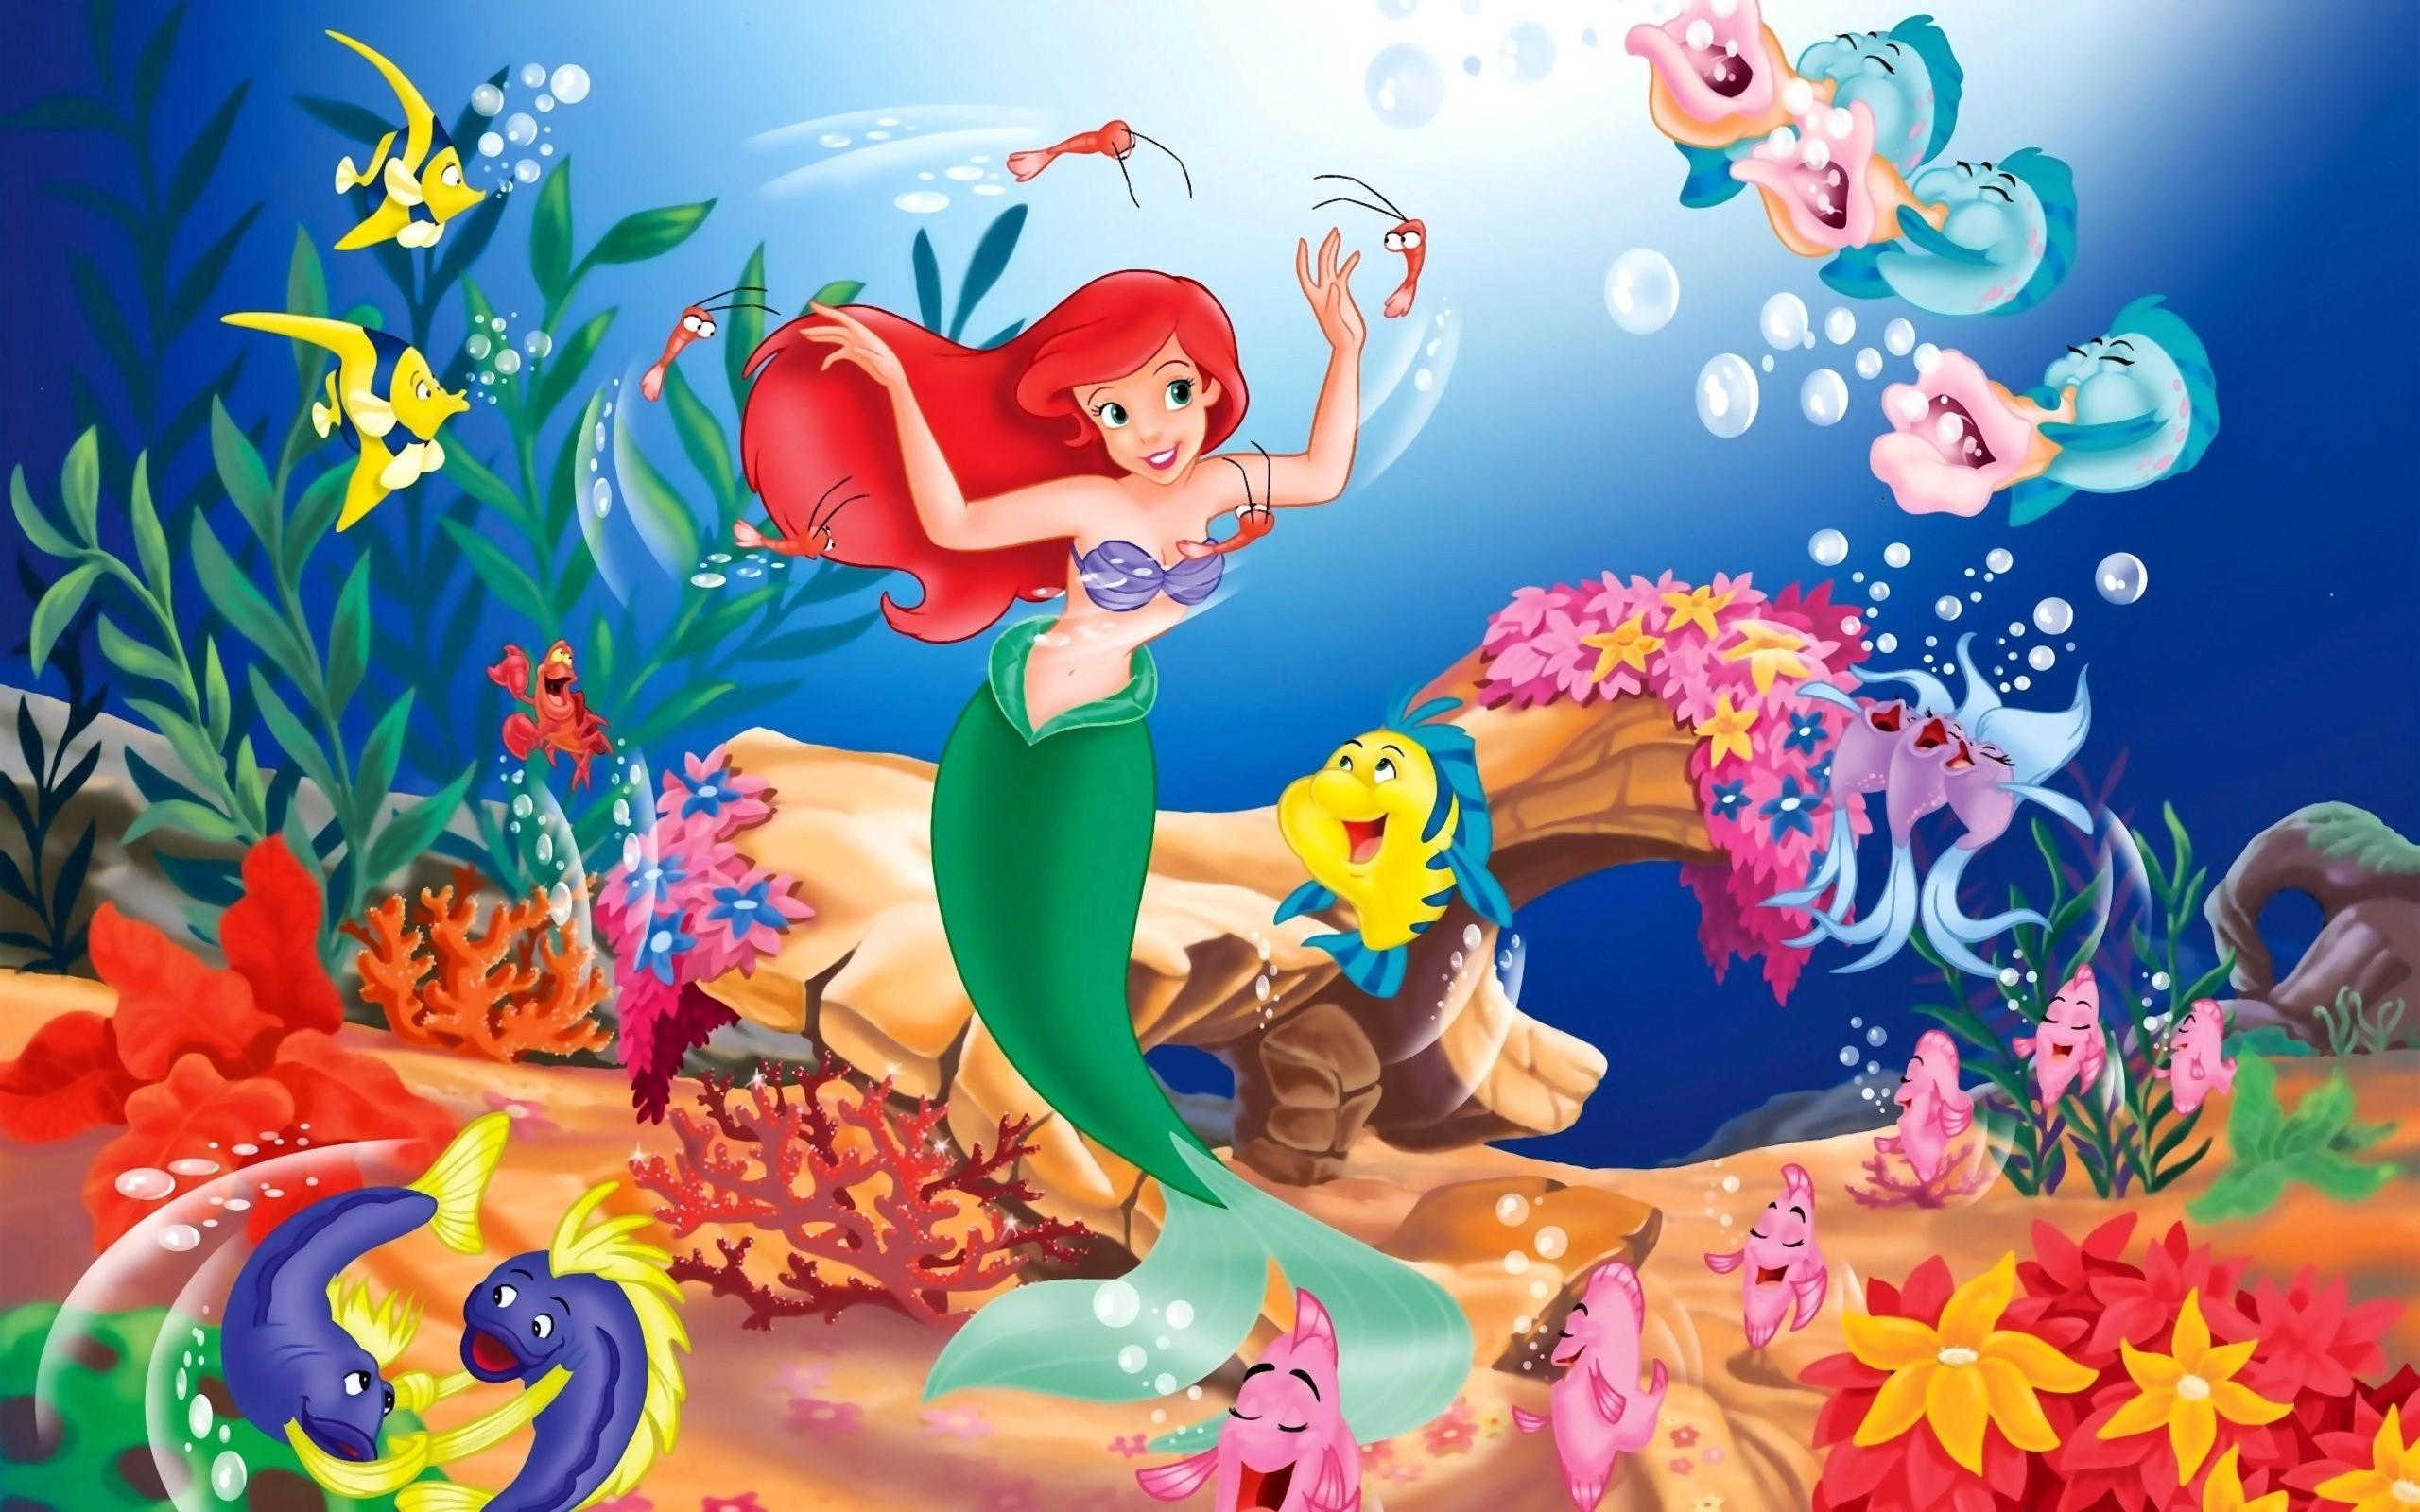 Disney Wallpaper Hd 70 Images